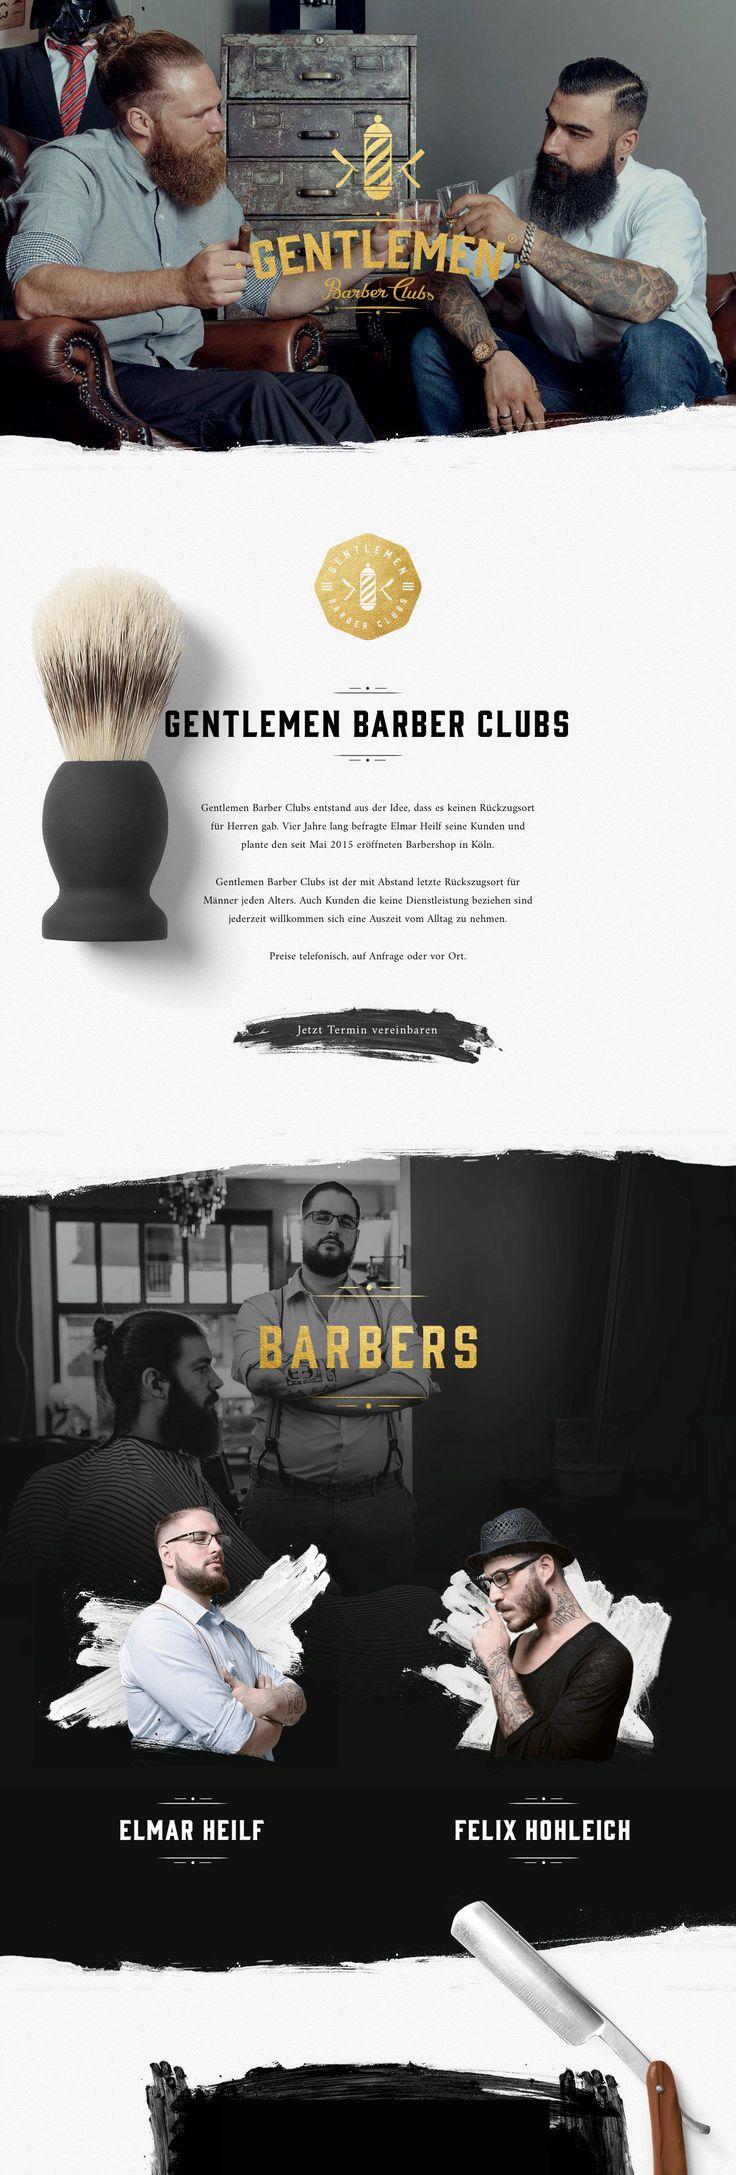 Gentlemen Barber Clubs (More web design inspiration at topdesigninspiration.com)…